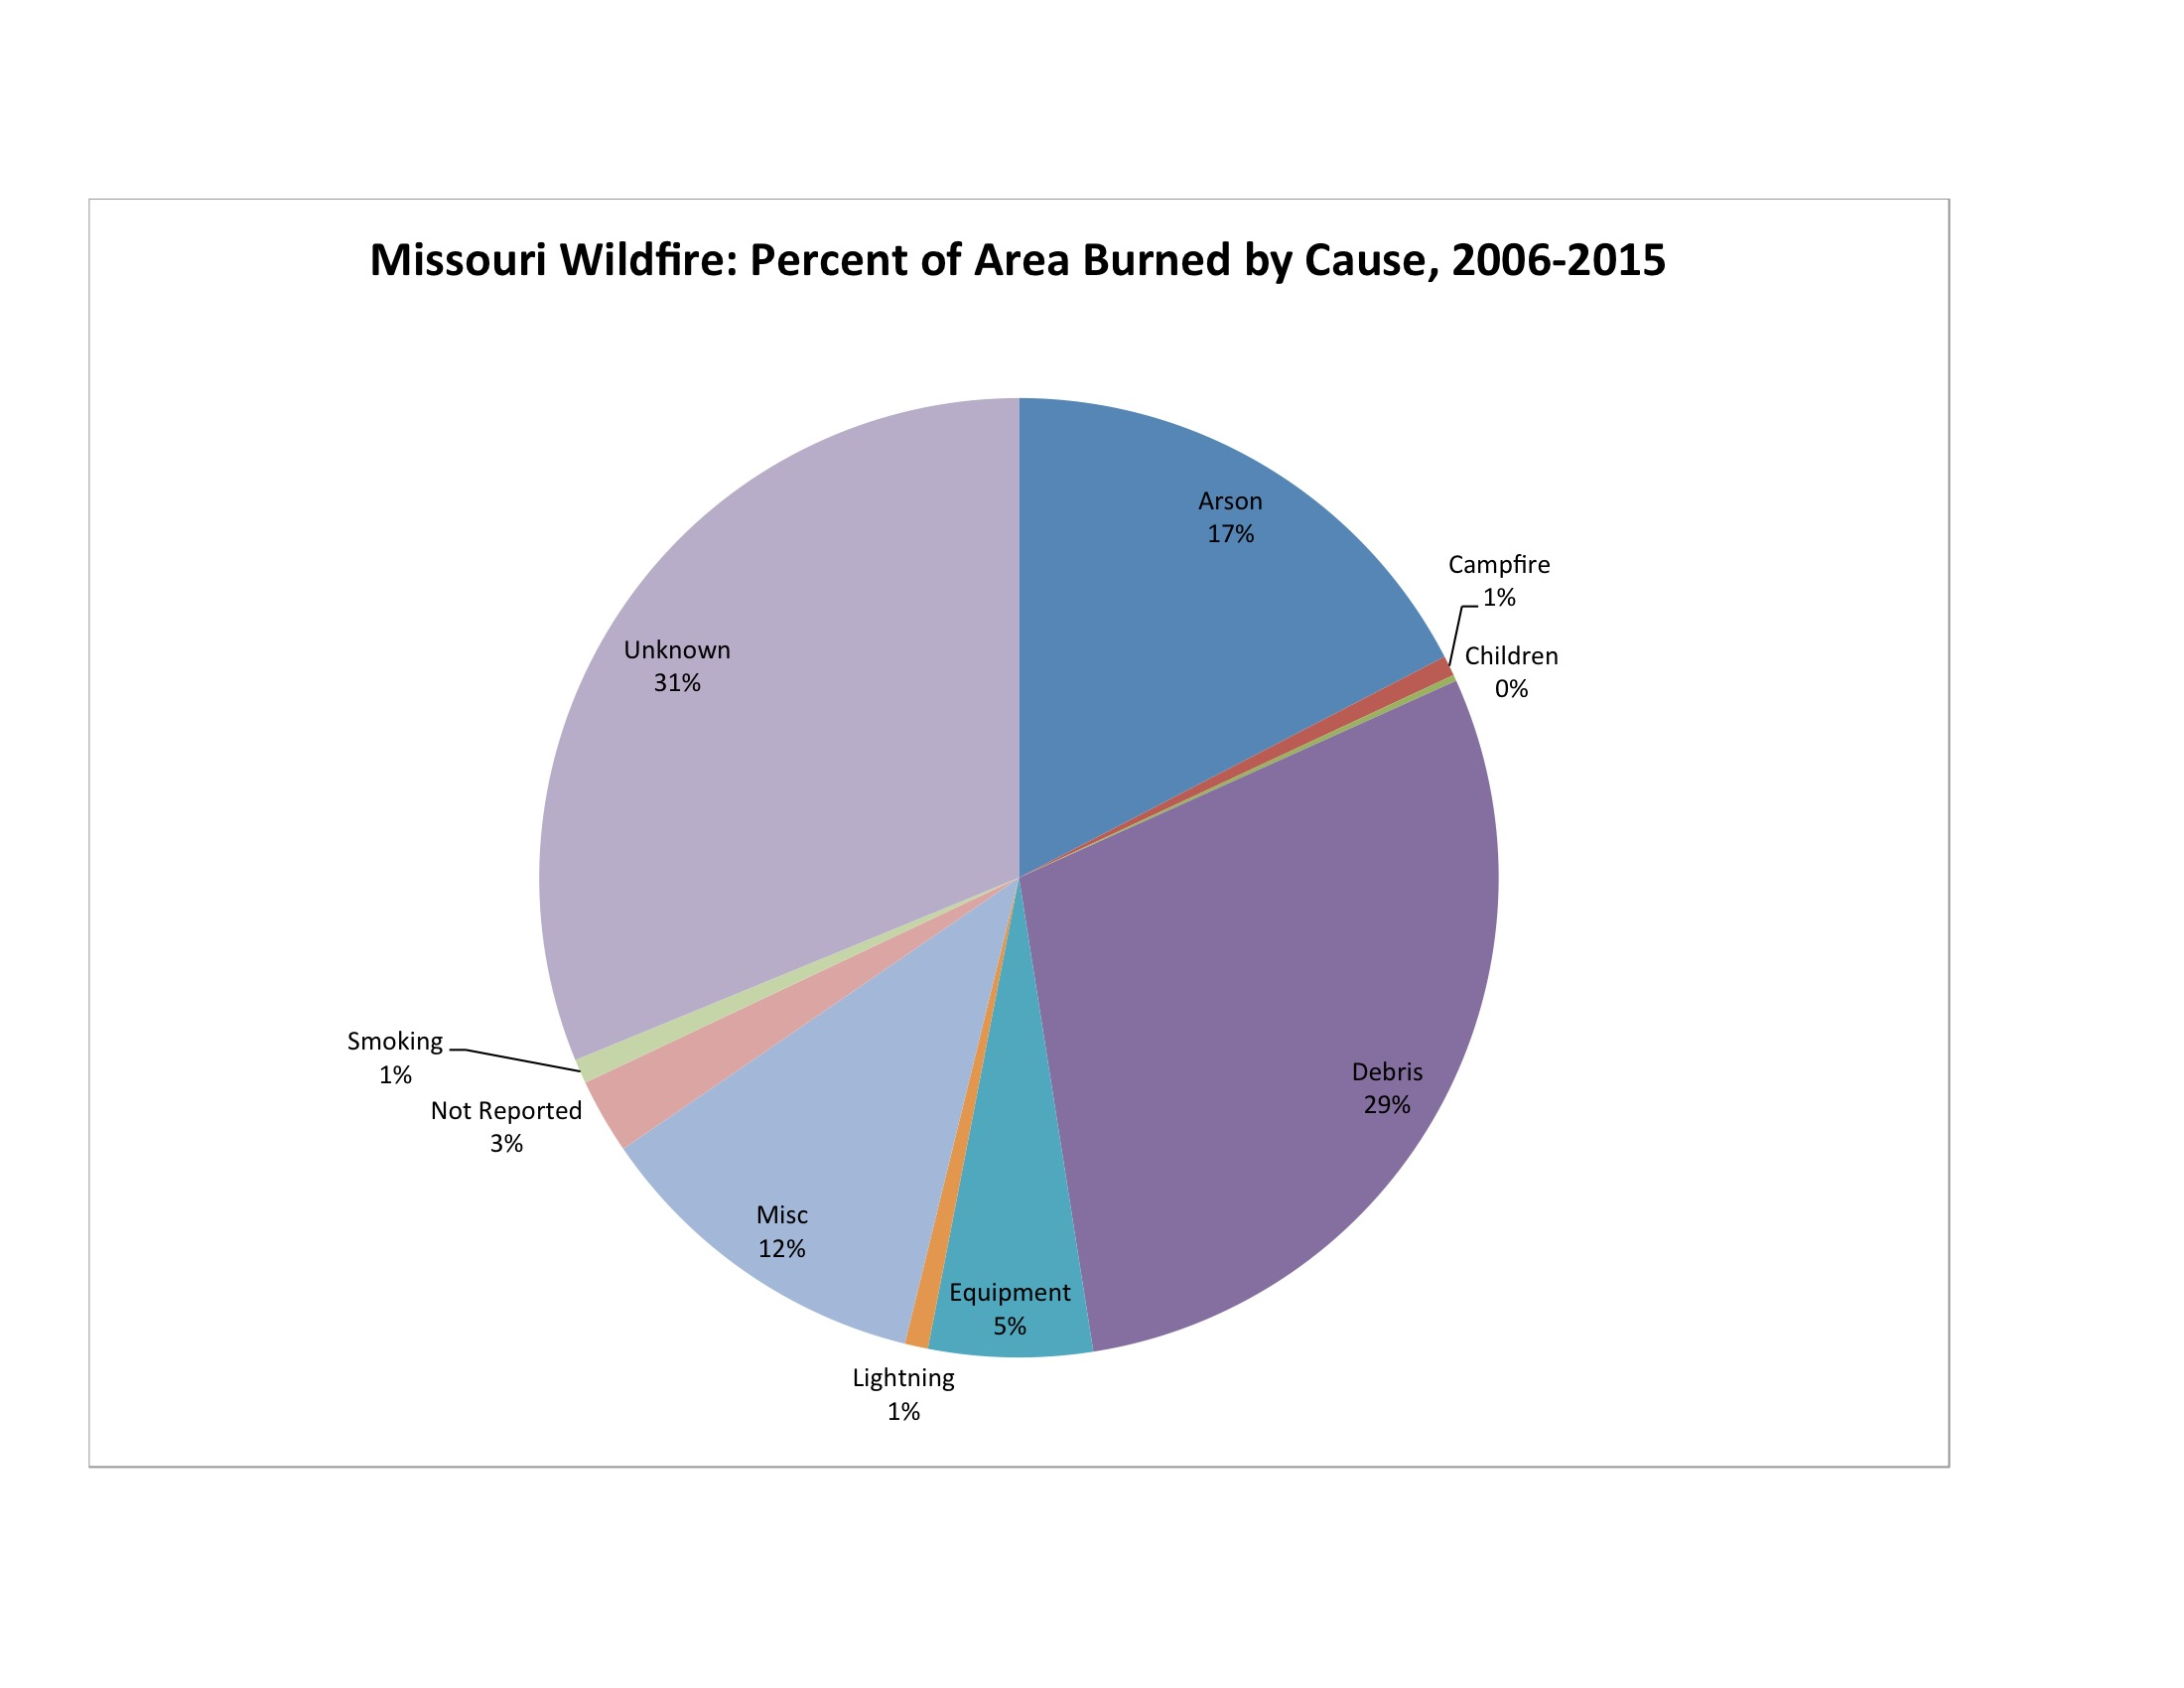 Mogreenstats missouris environmental statistics page 6 data source missouri department of conservation nvjuhfo Choice Image